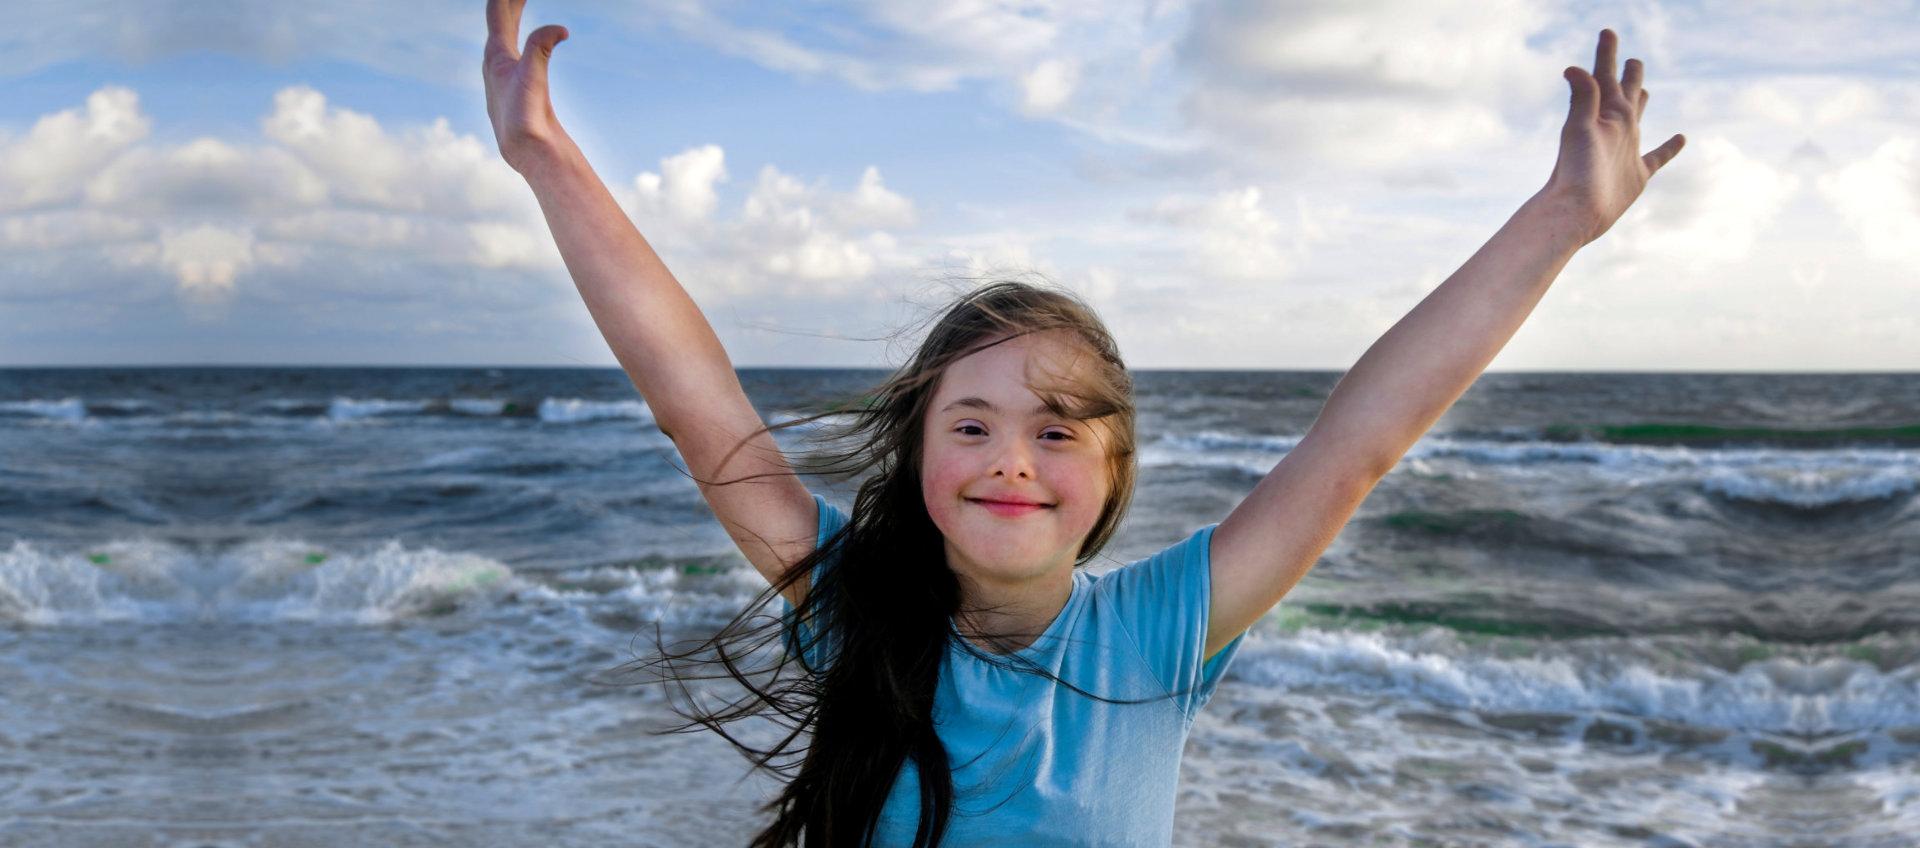 young girl raising her hands